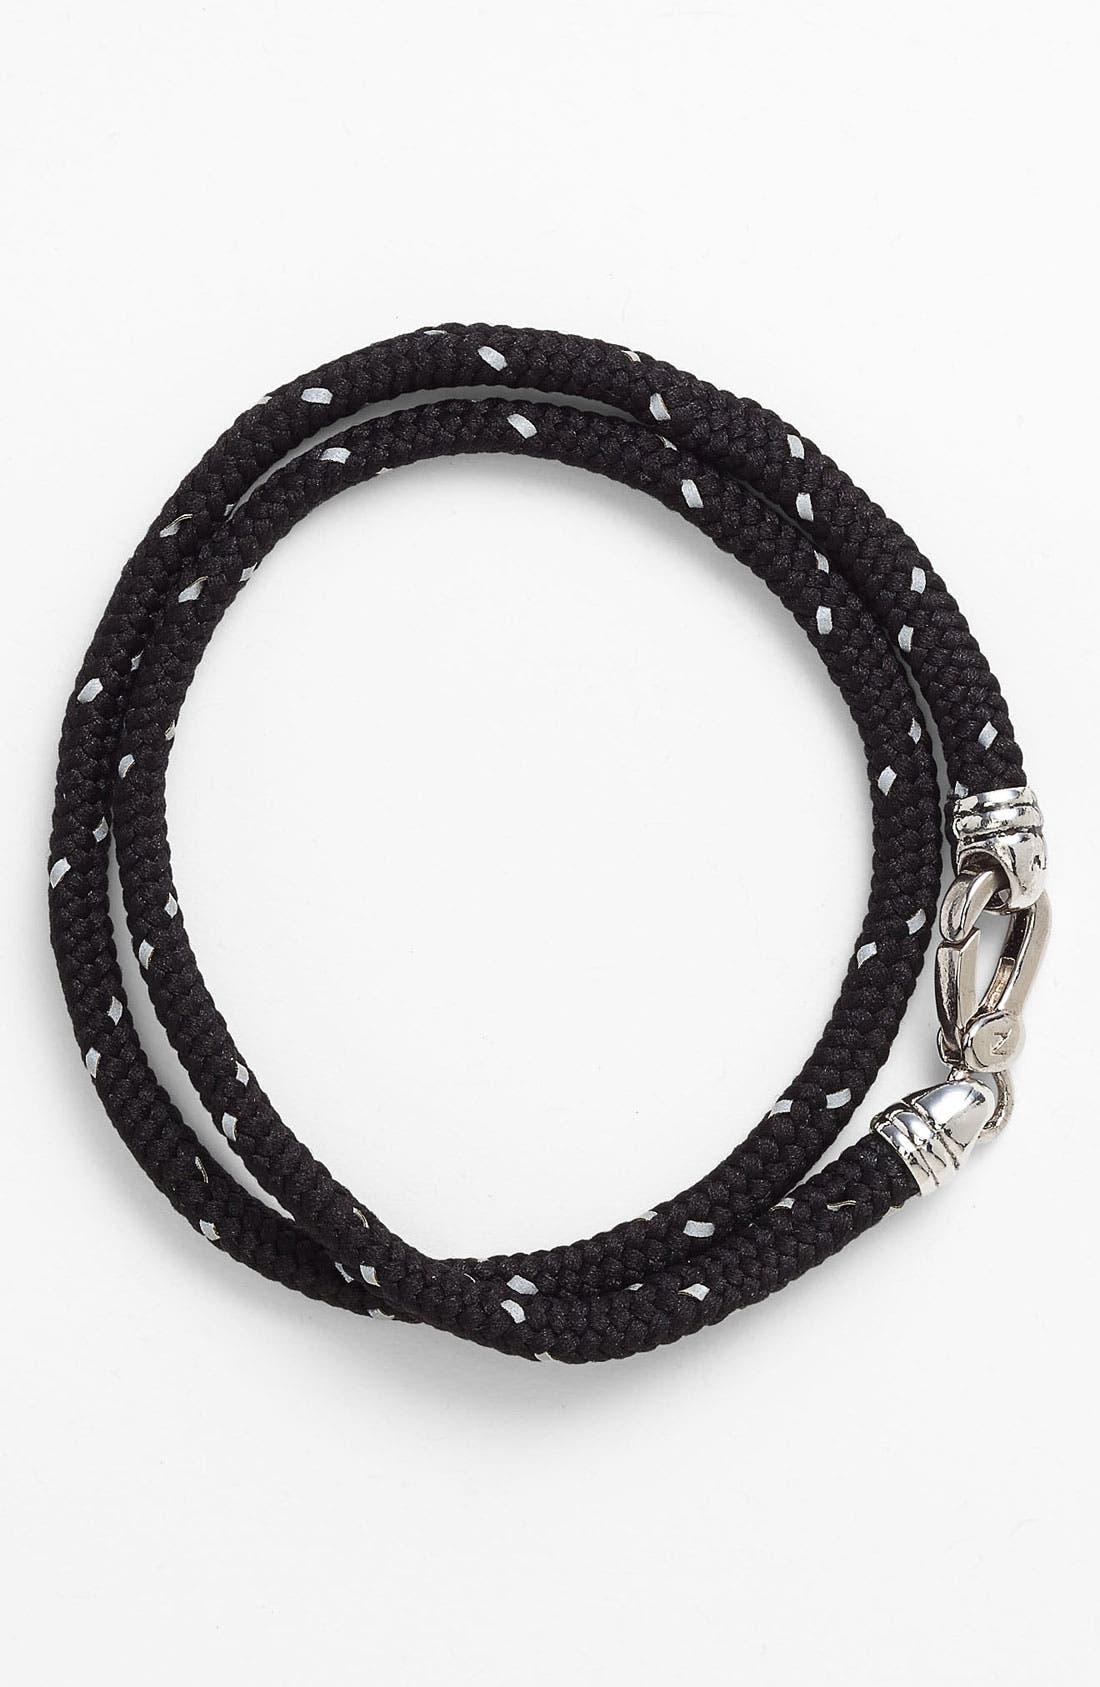 Wrap Cord Bracelet,                             Main thumbnail 1, color,                             Black